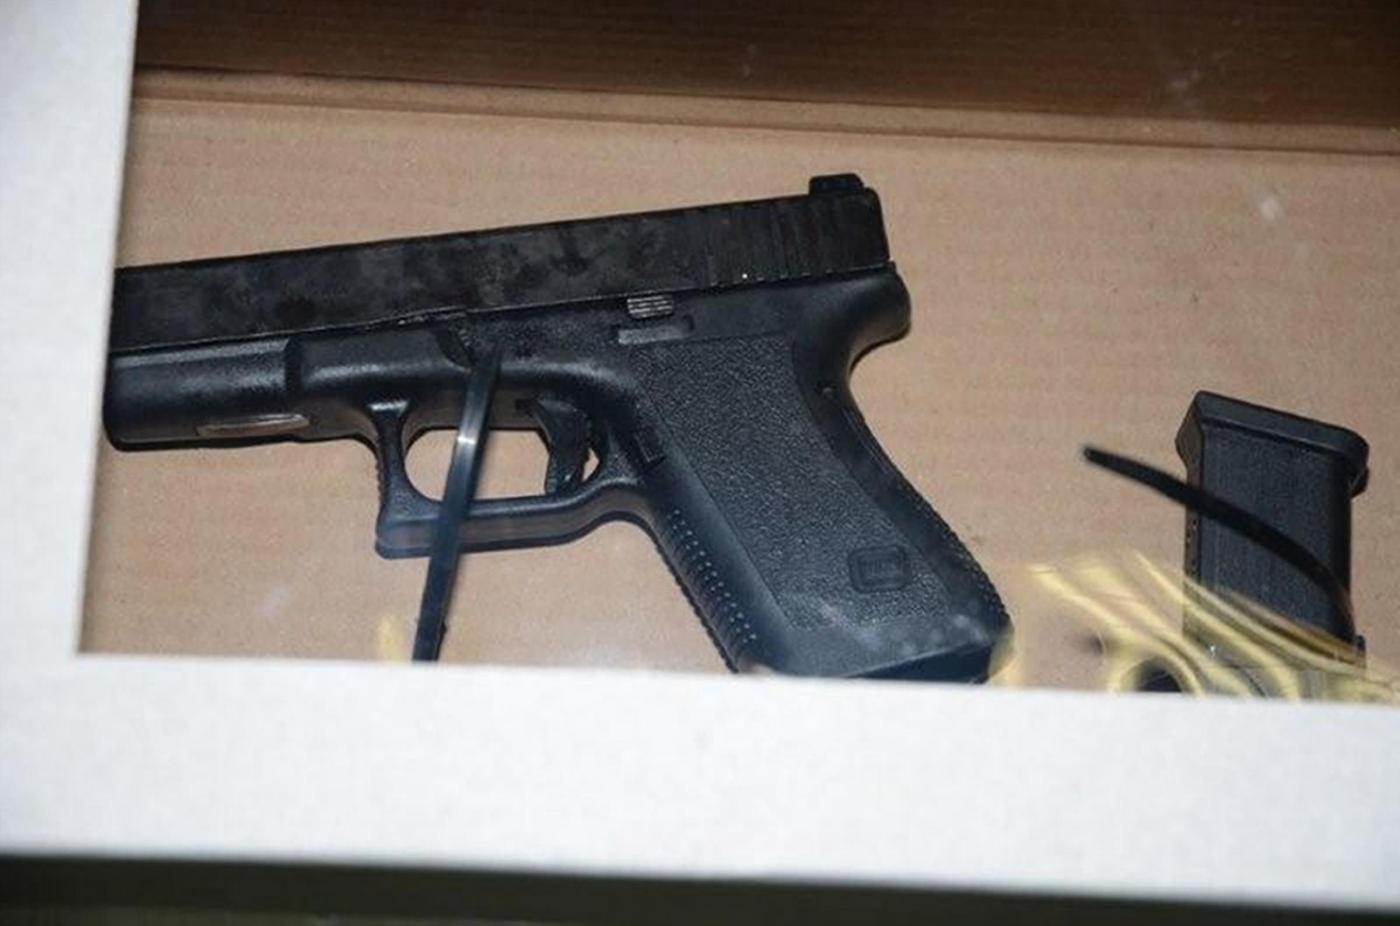 Guns recovered